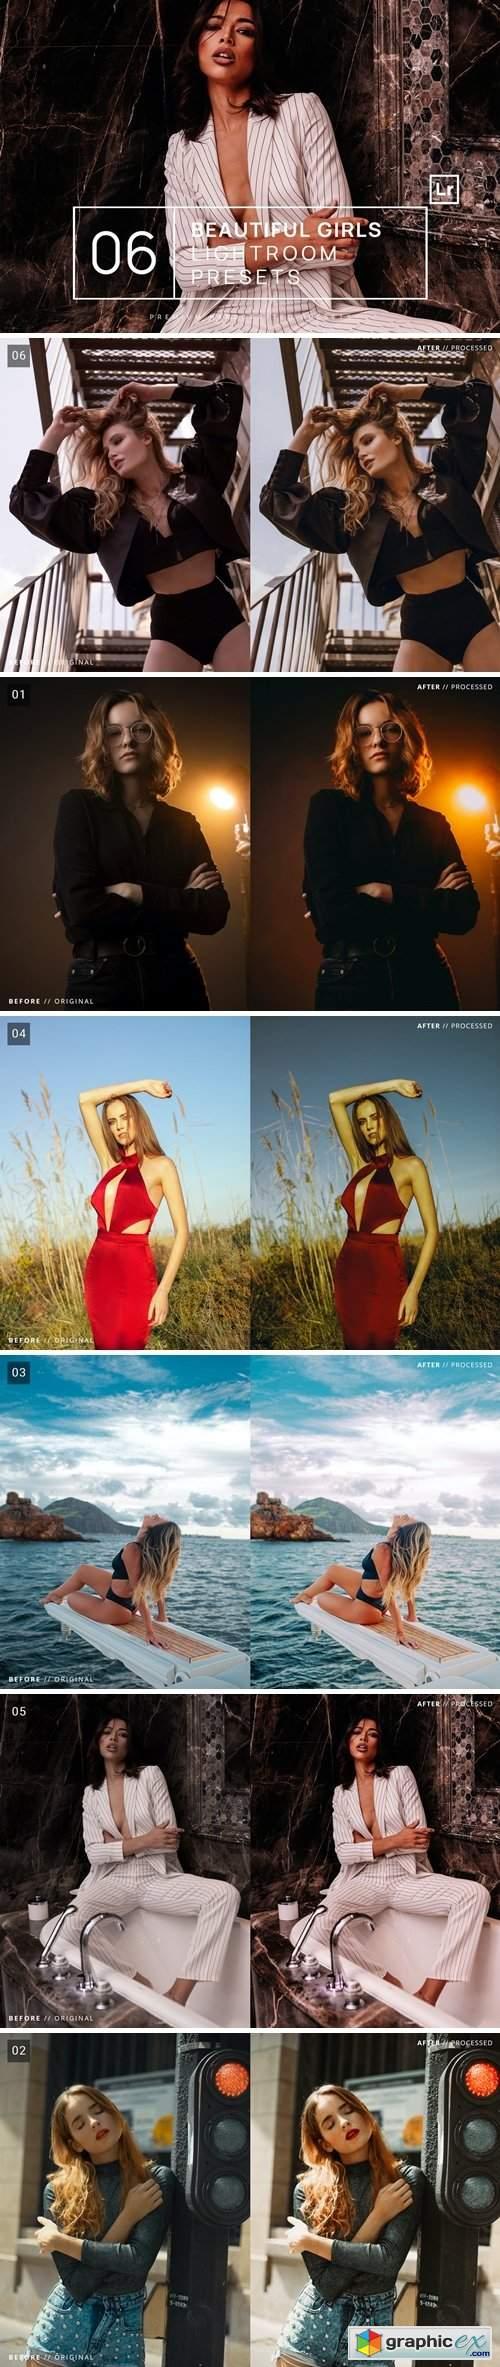 6 Beautiful Girls Lightroom Presets + Mobile